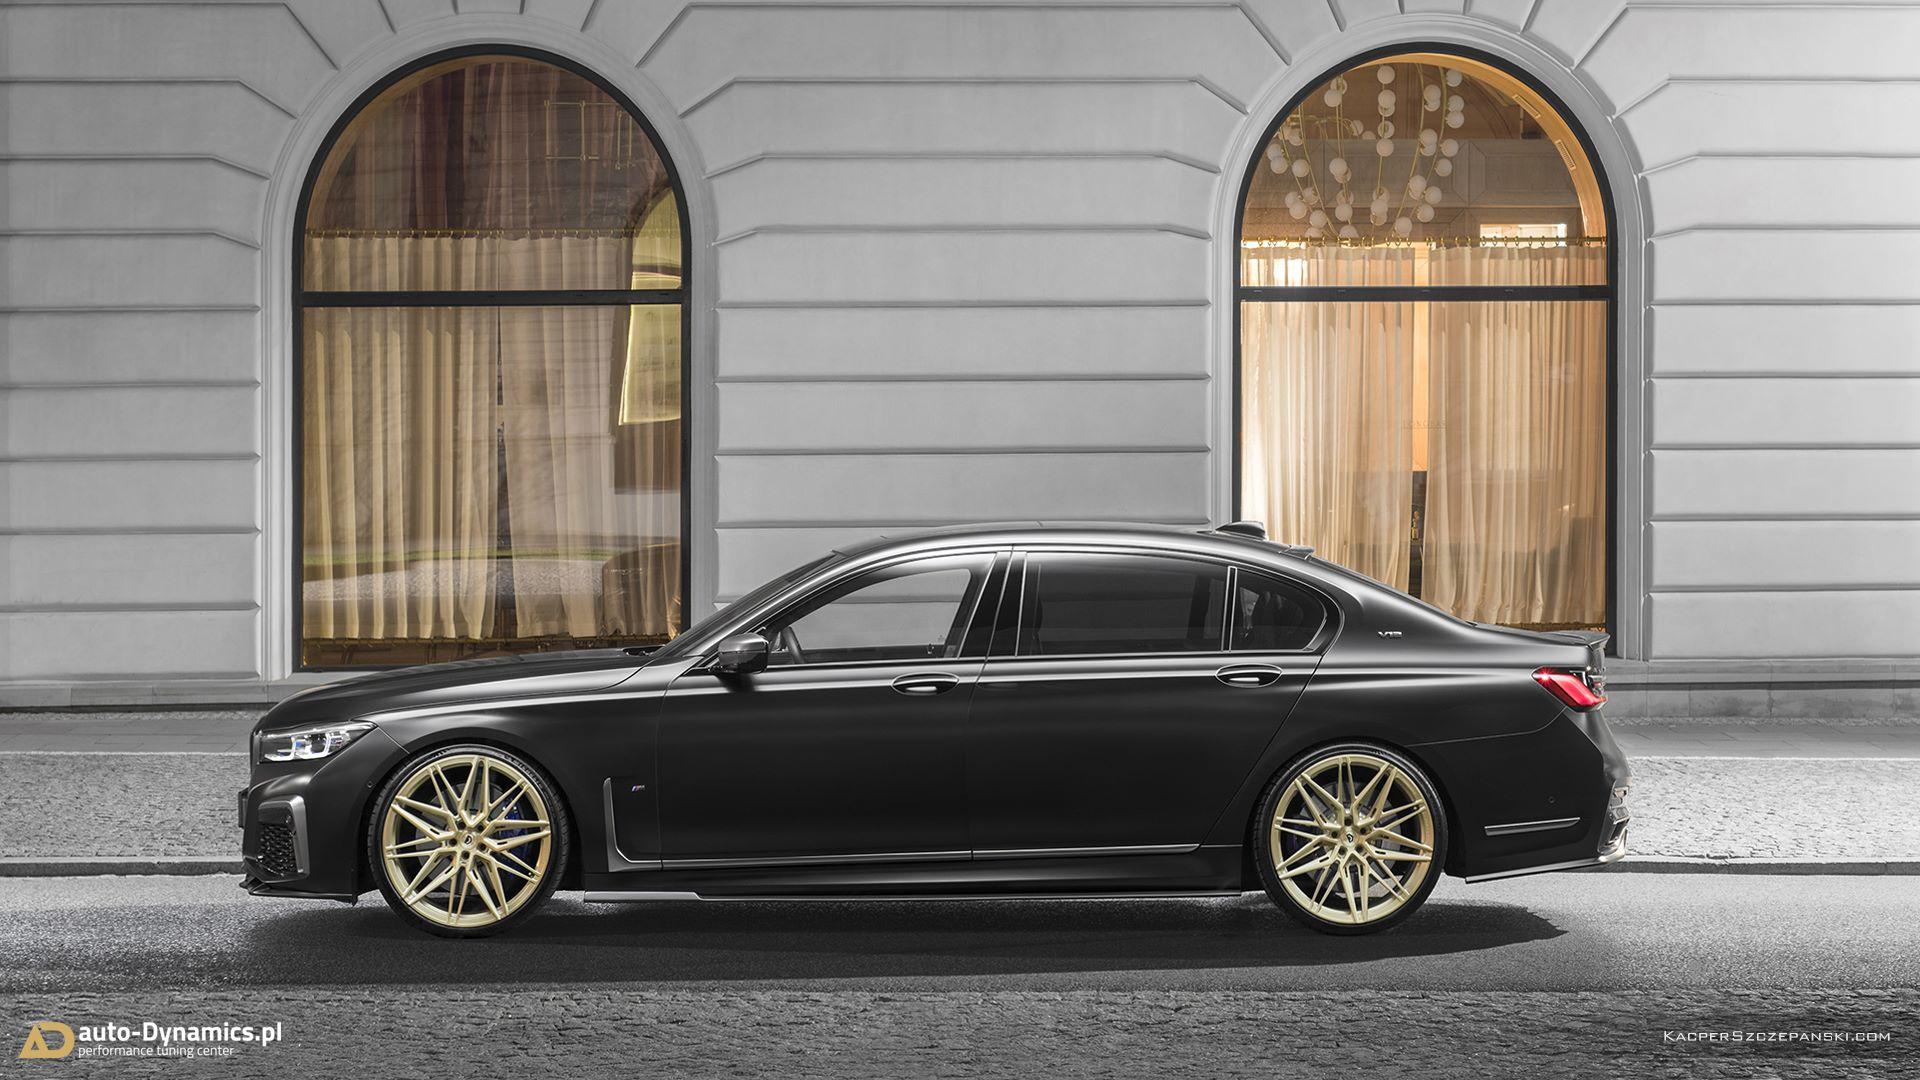 BMW-M760Li-by-Auto-Dynamics-5